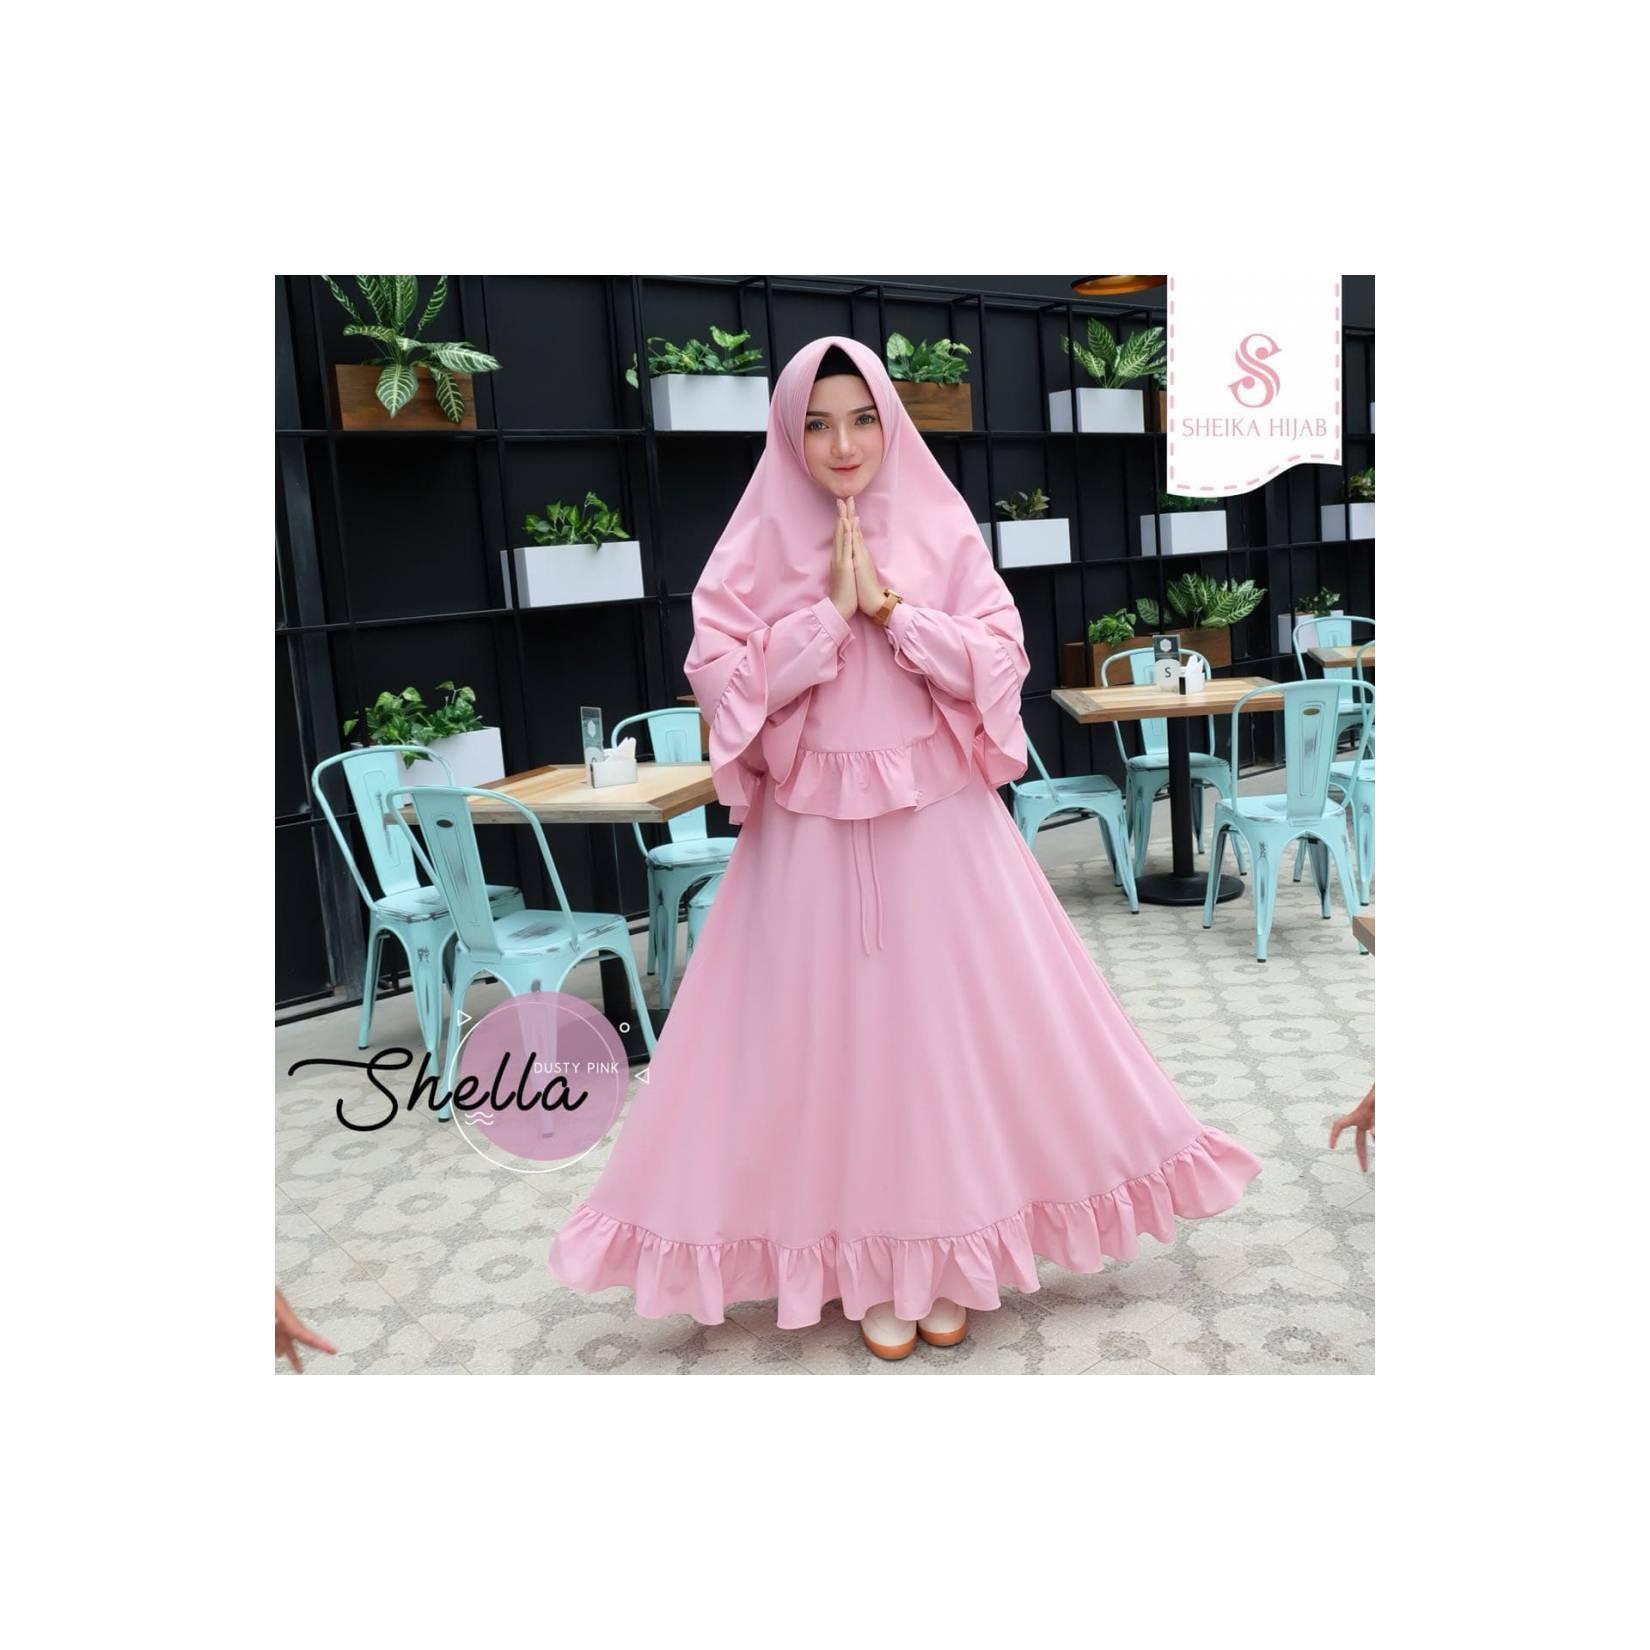 PROMO ORIGINAL TERBARU Gamis Sheika Hijab Shella Dress Dusty Pink baj